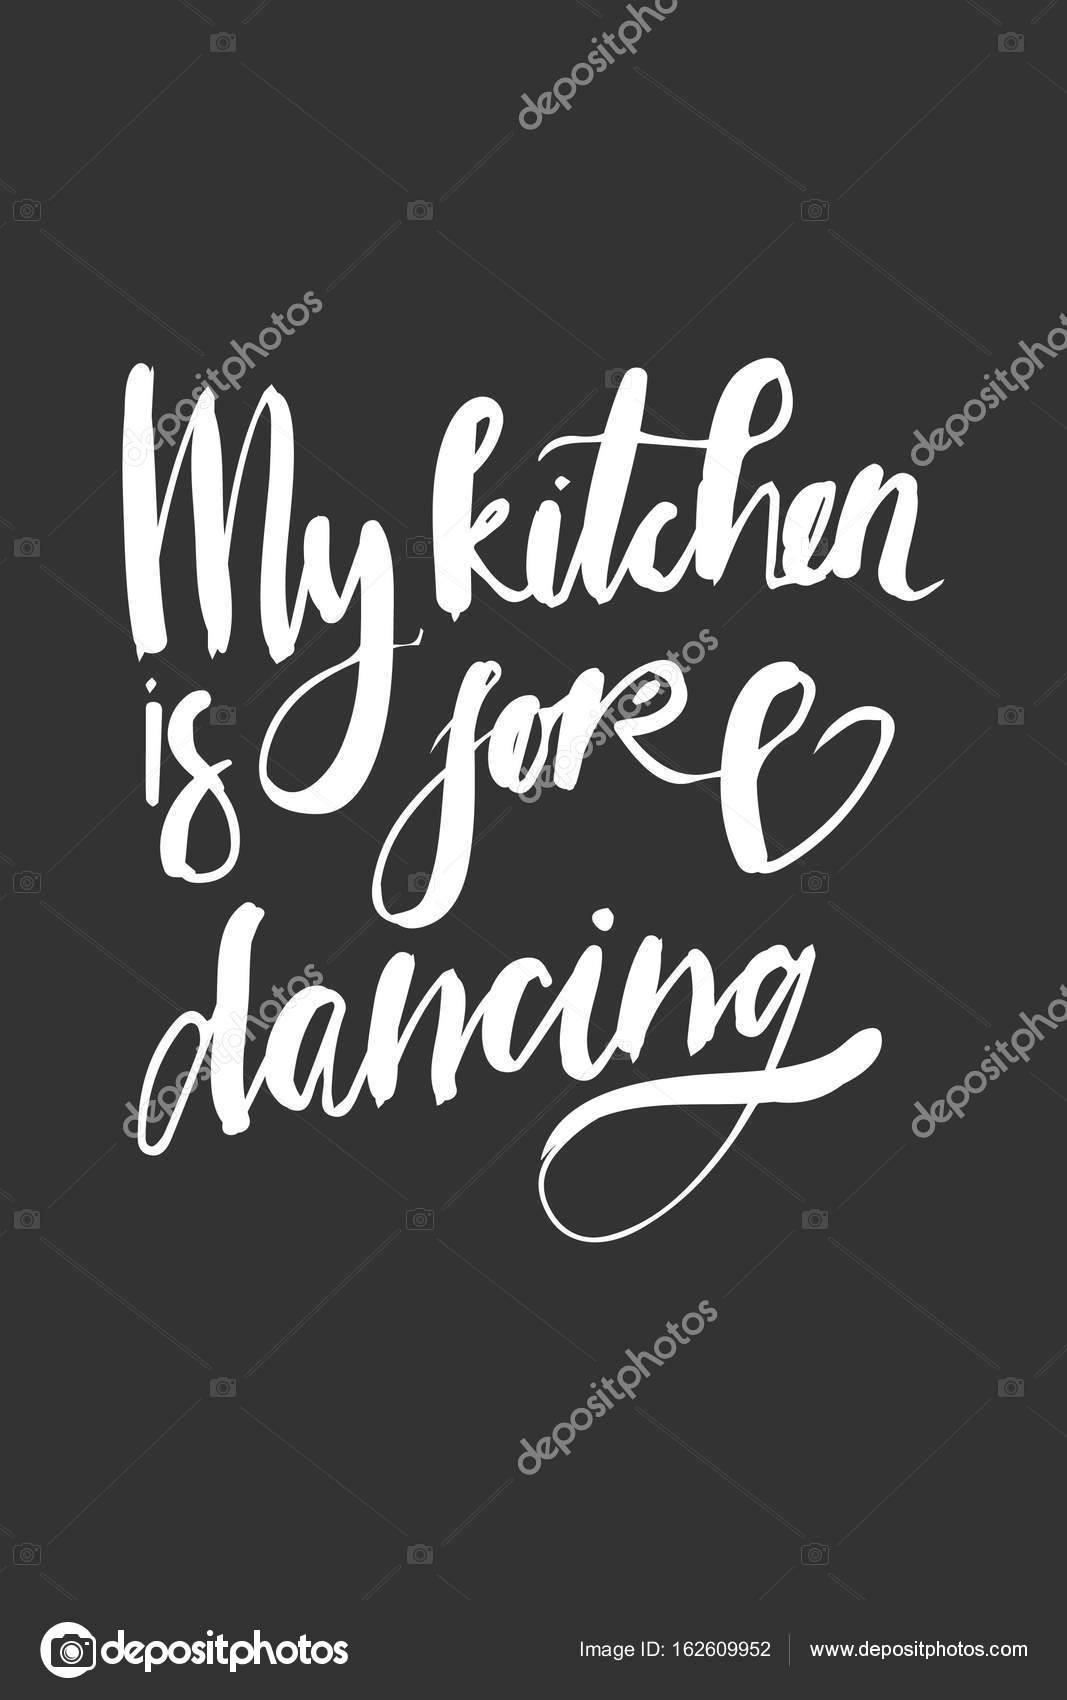 kitchen art prints modern mat 生活就是食物 食物是一种艺术 好的食物是好心情 我的厨房是跳舞 图库 食物使我快乐 热量在周末就不算数 吃 喝 thanlful 享受